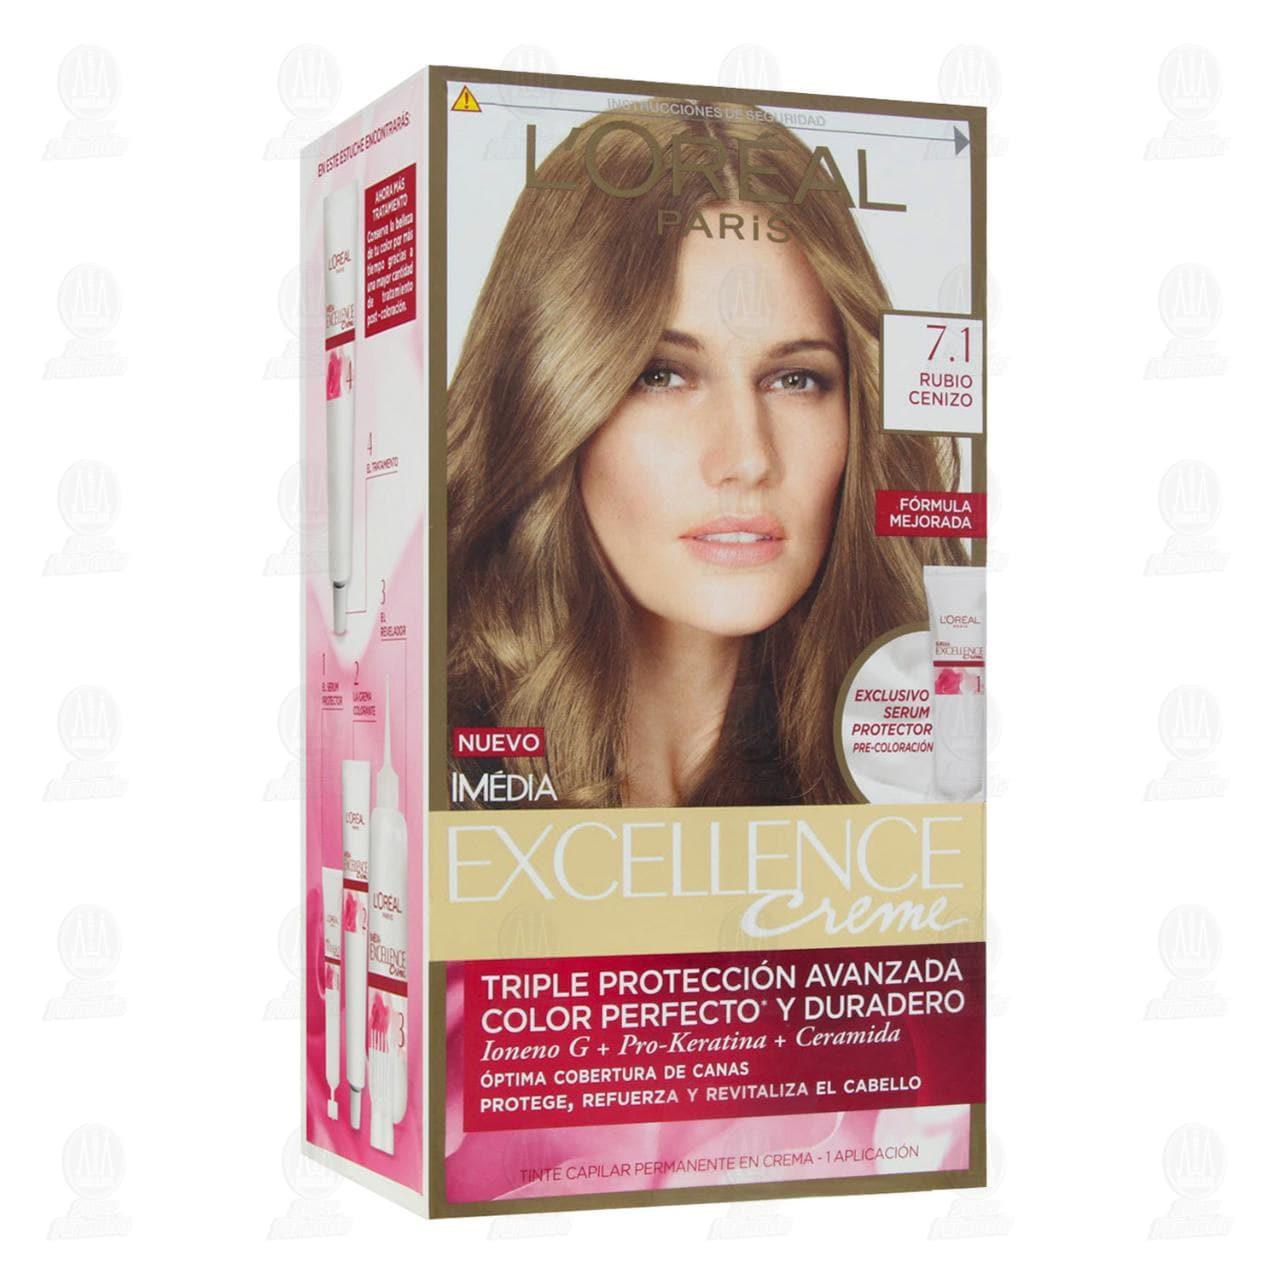 Tinte Excellence Creme Triple Protección Avanzada Color Rubio Cenizo, 7 pzas.